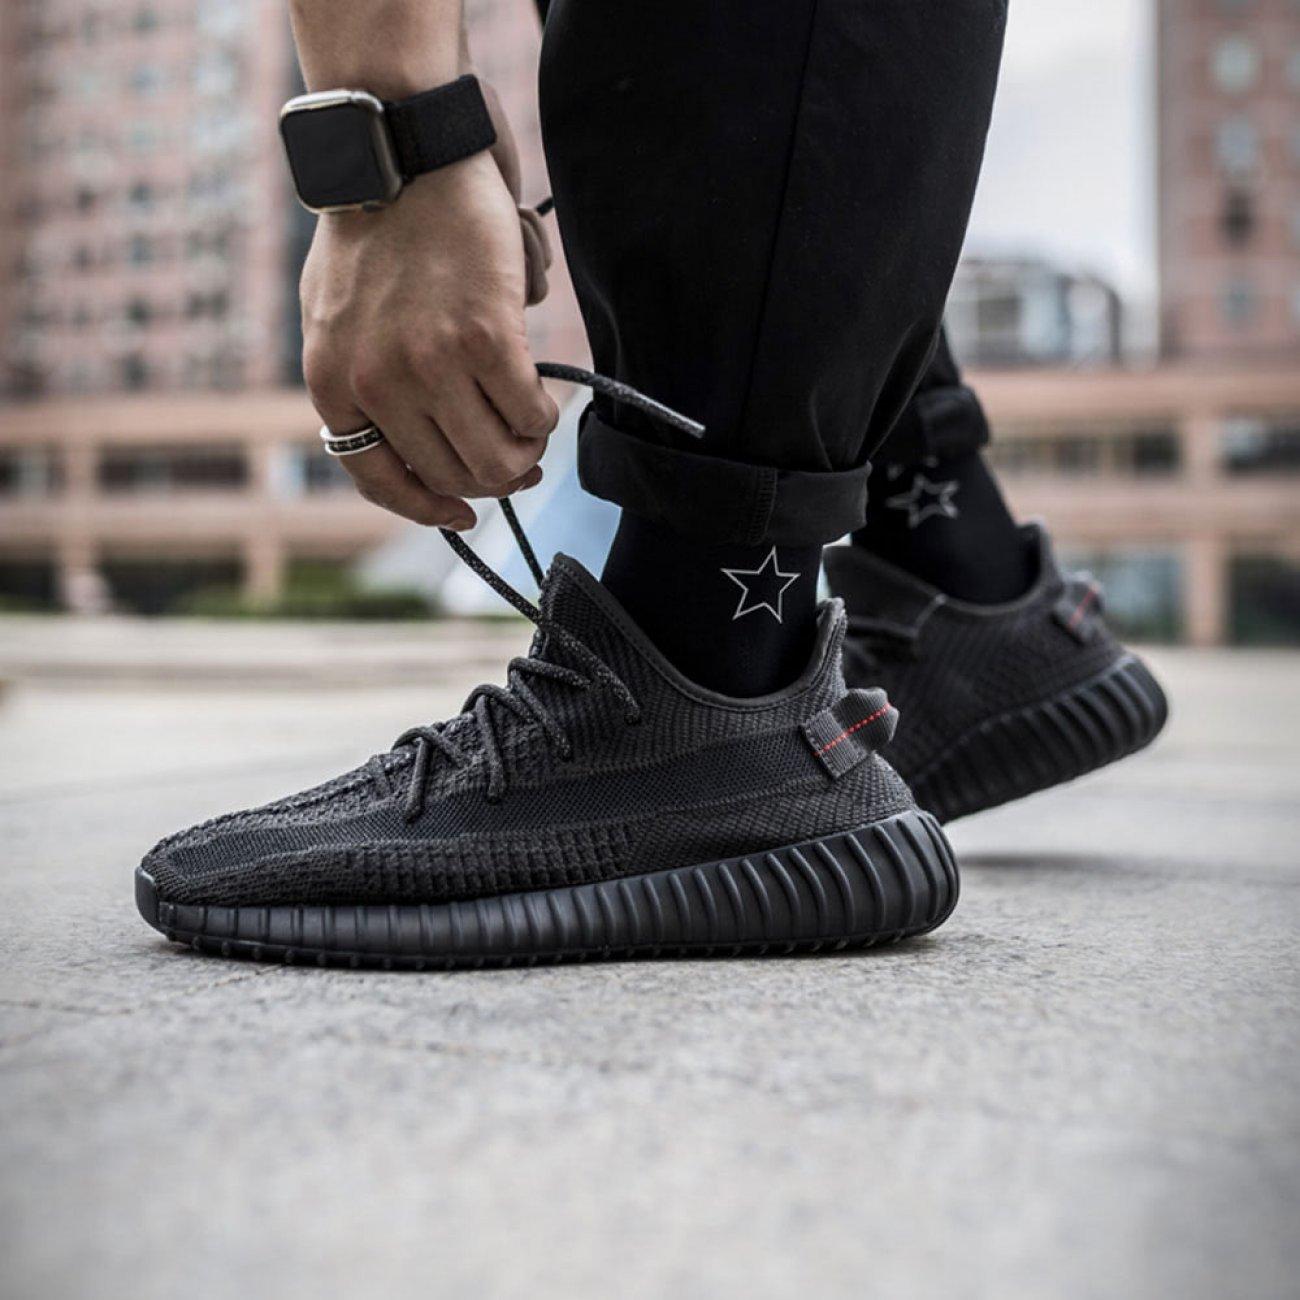 yeezy 350 static black